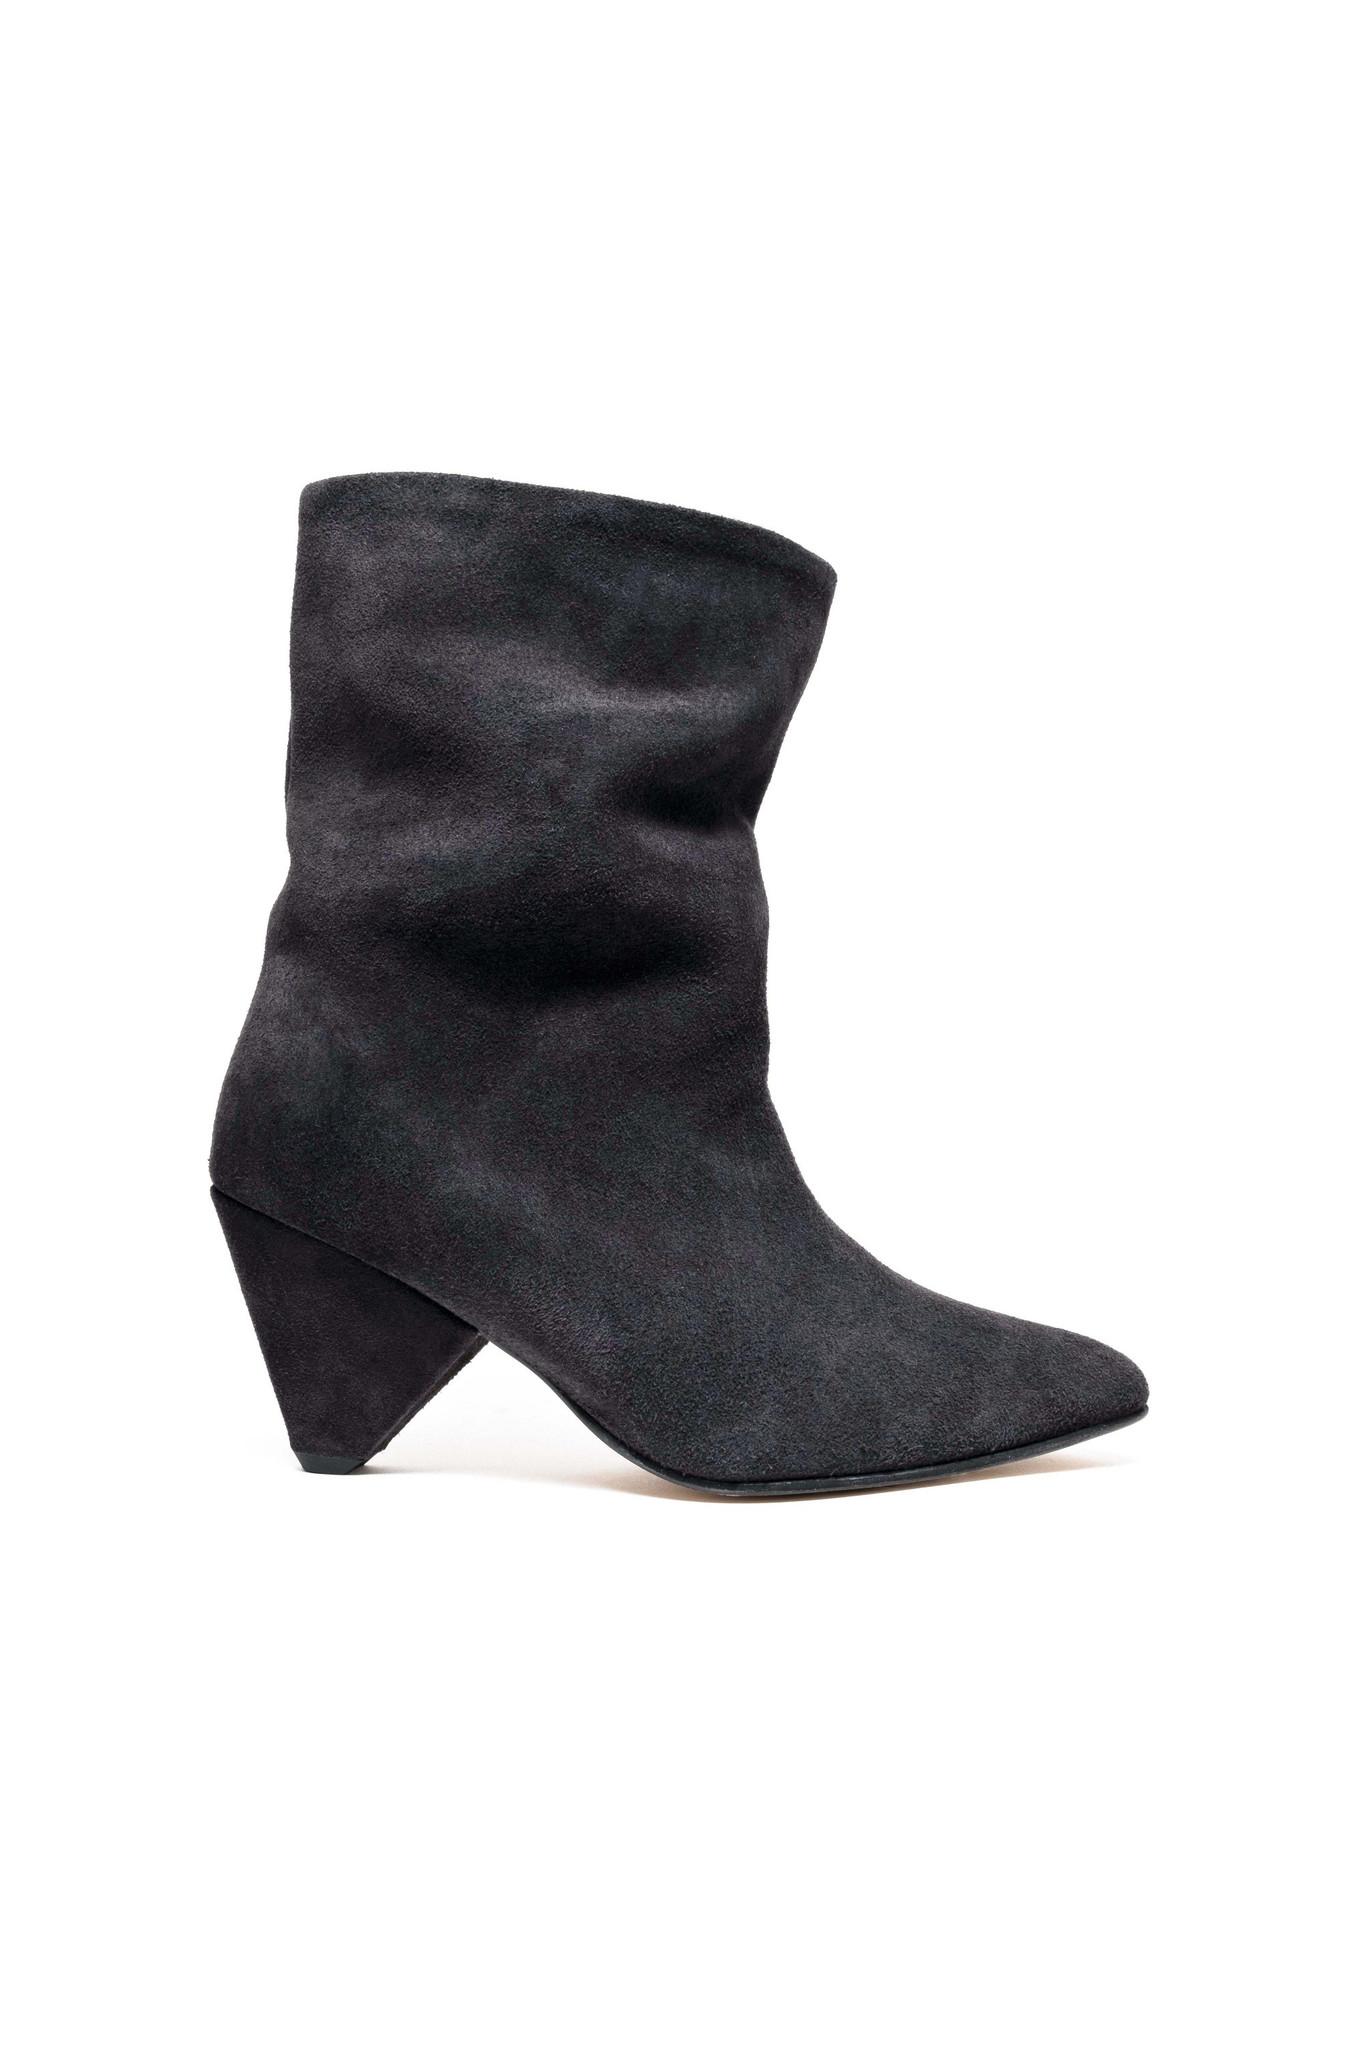 Vully 75 Triangle Calf Suede Boot - Dark Grey 38-1